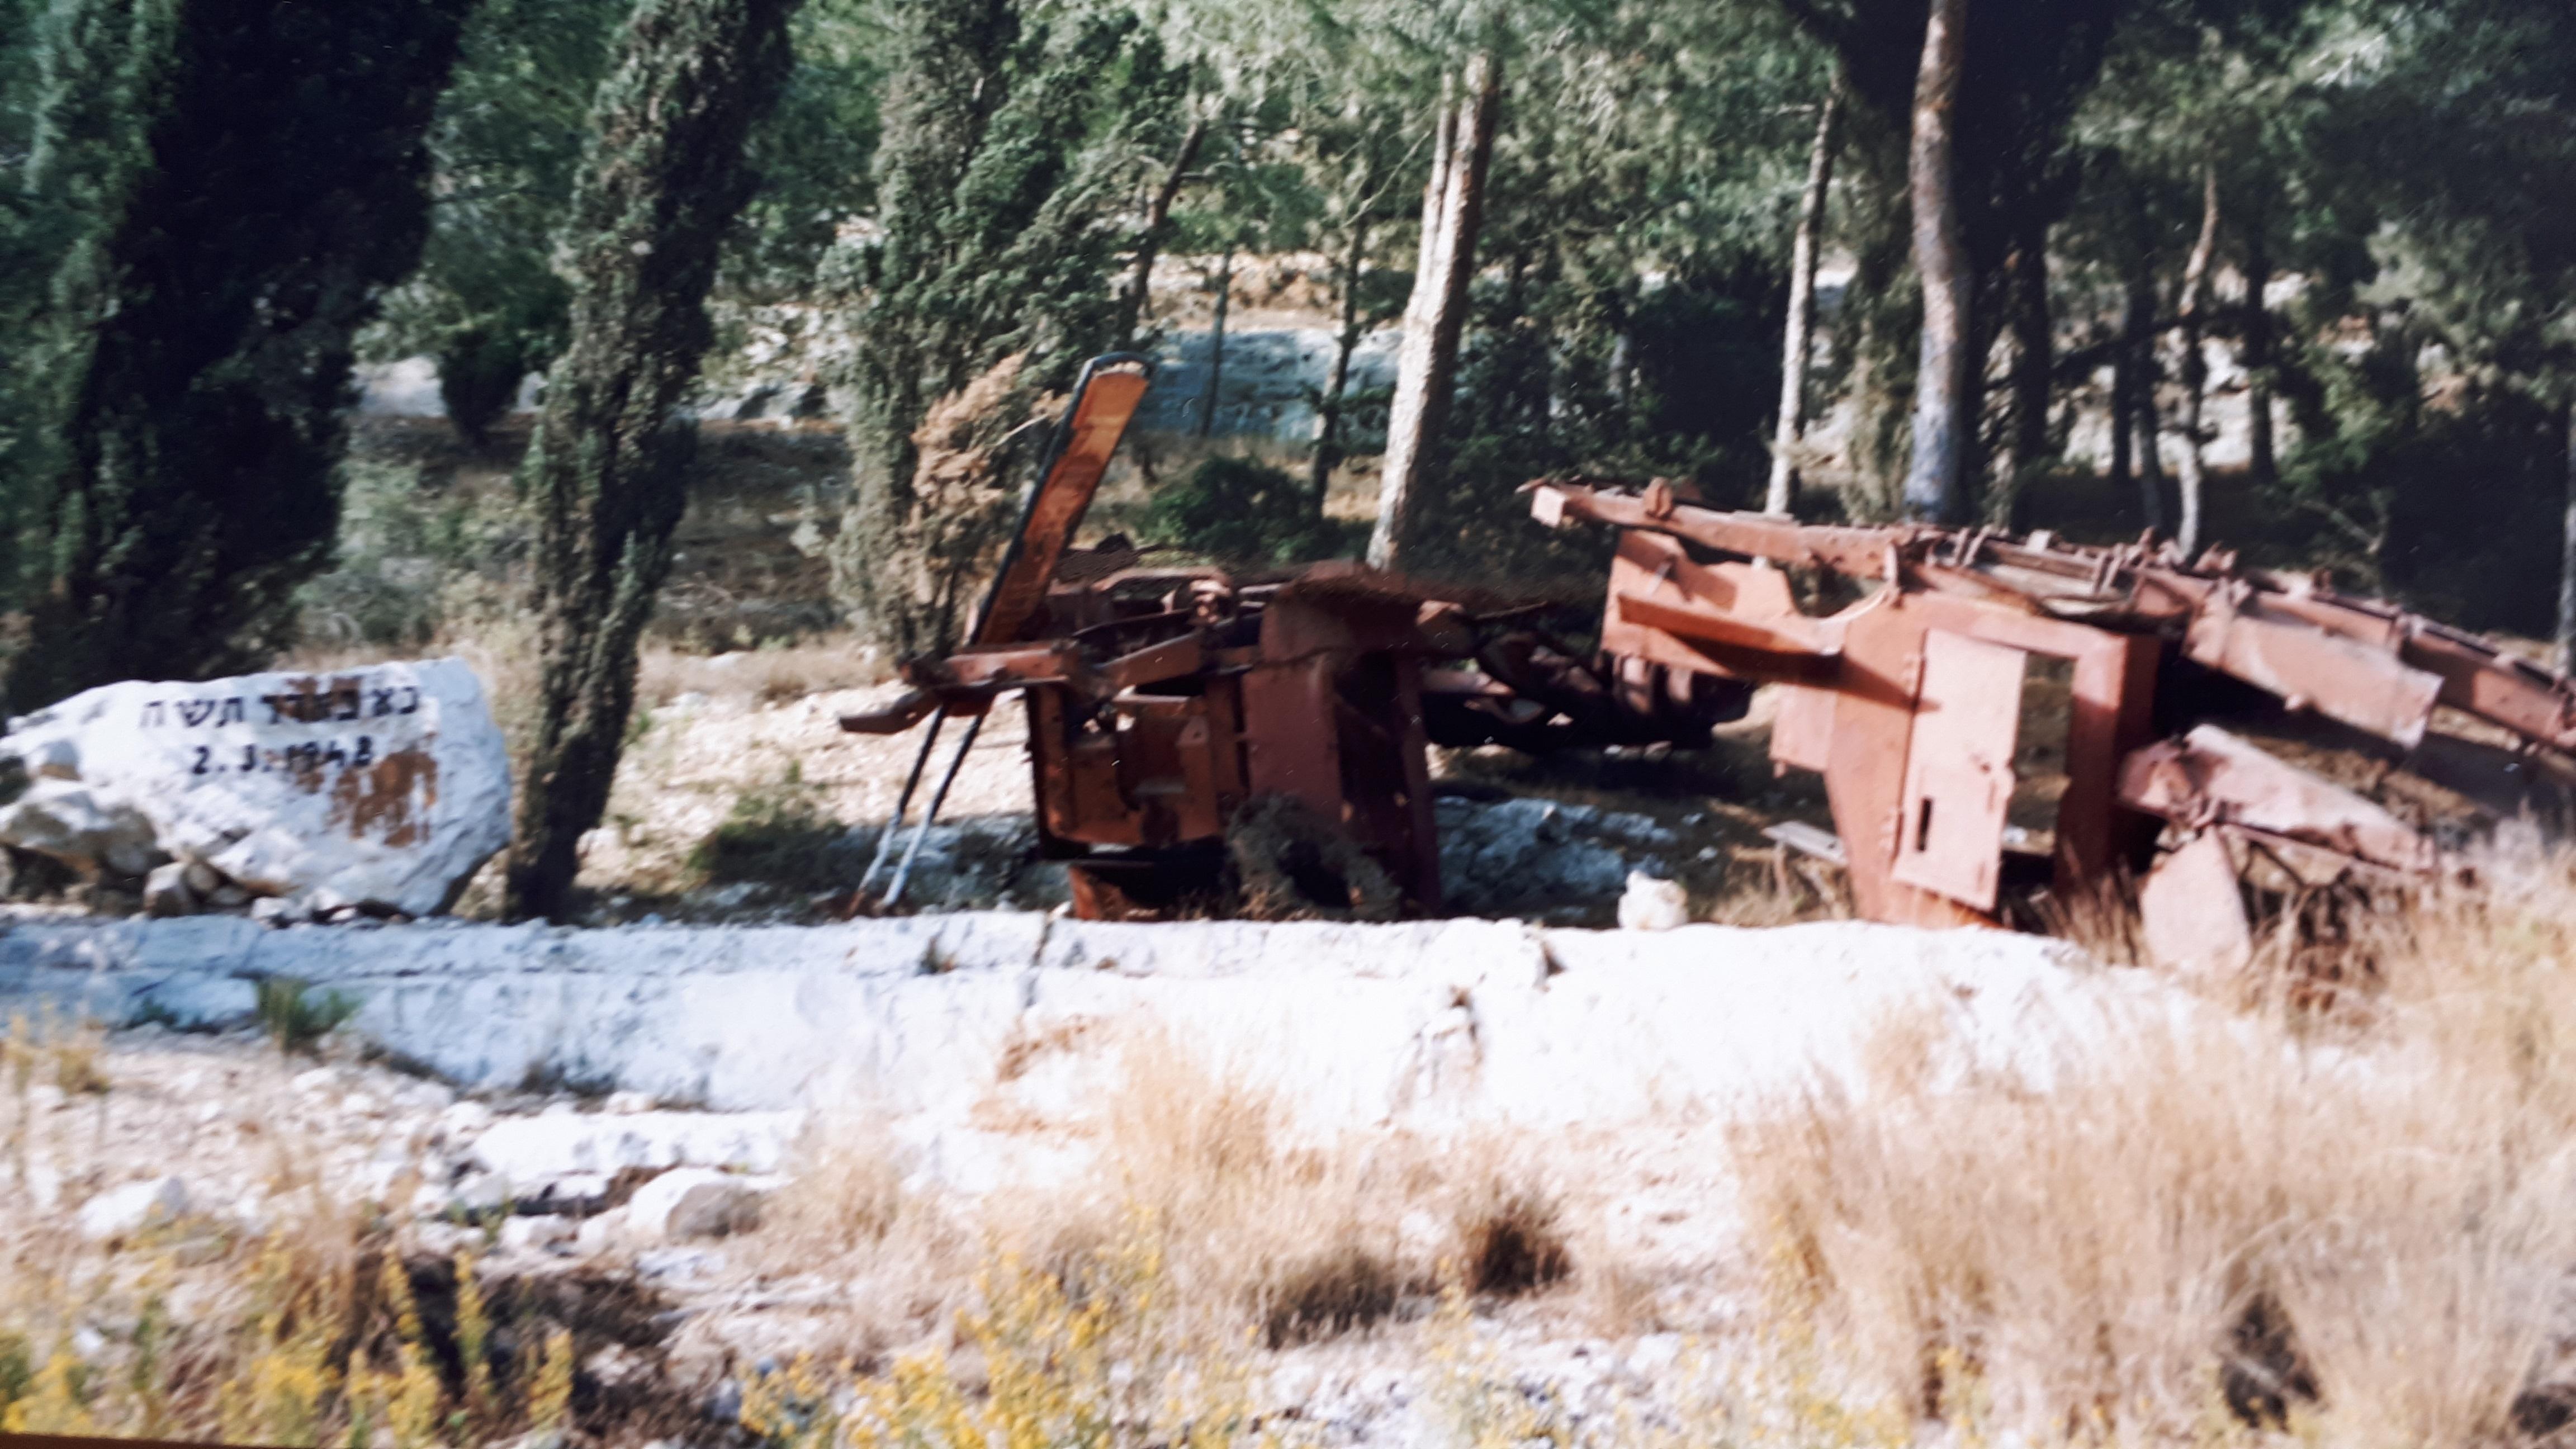 abandoned military equipment 1991 Israel